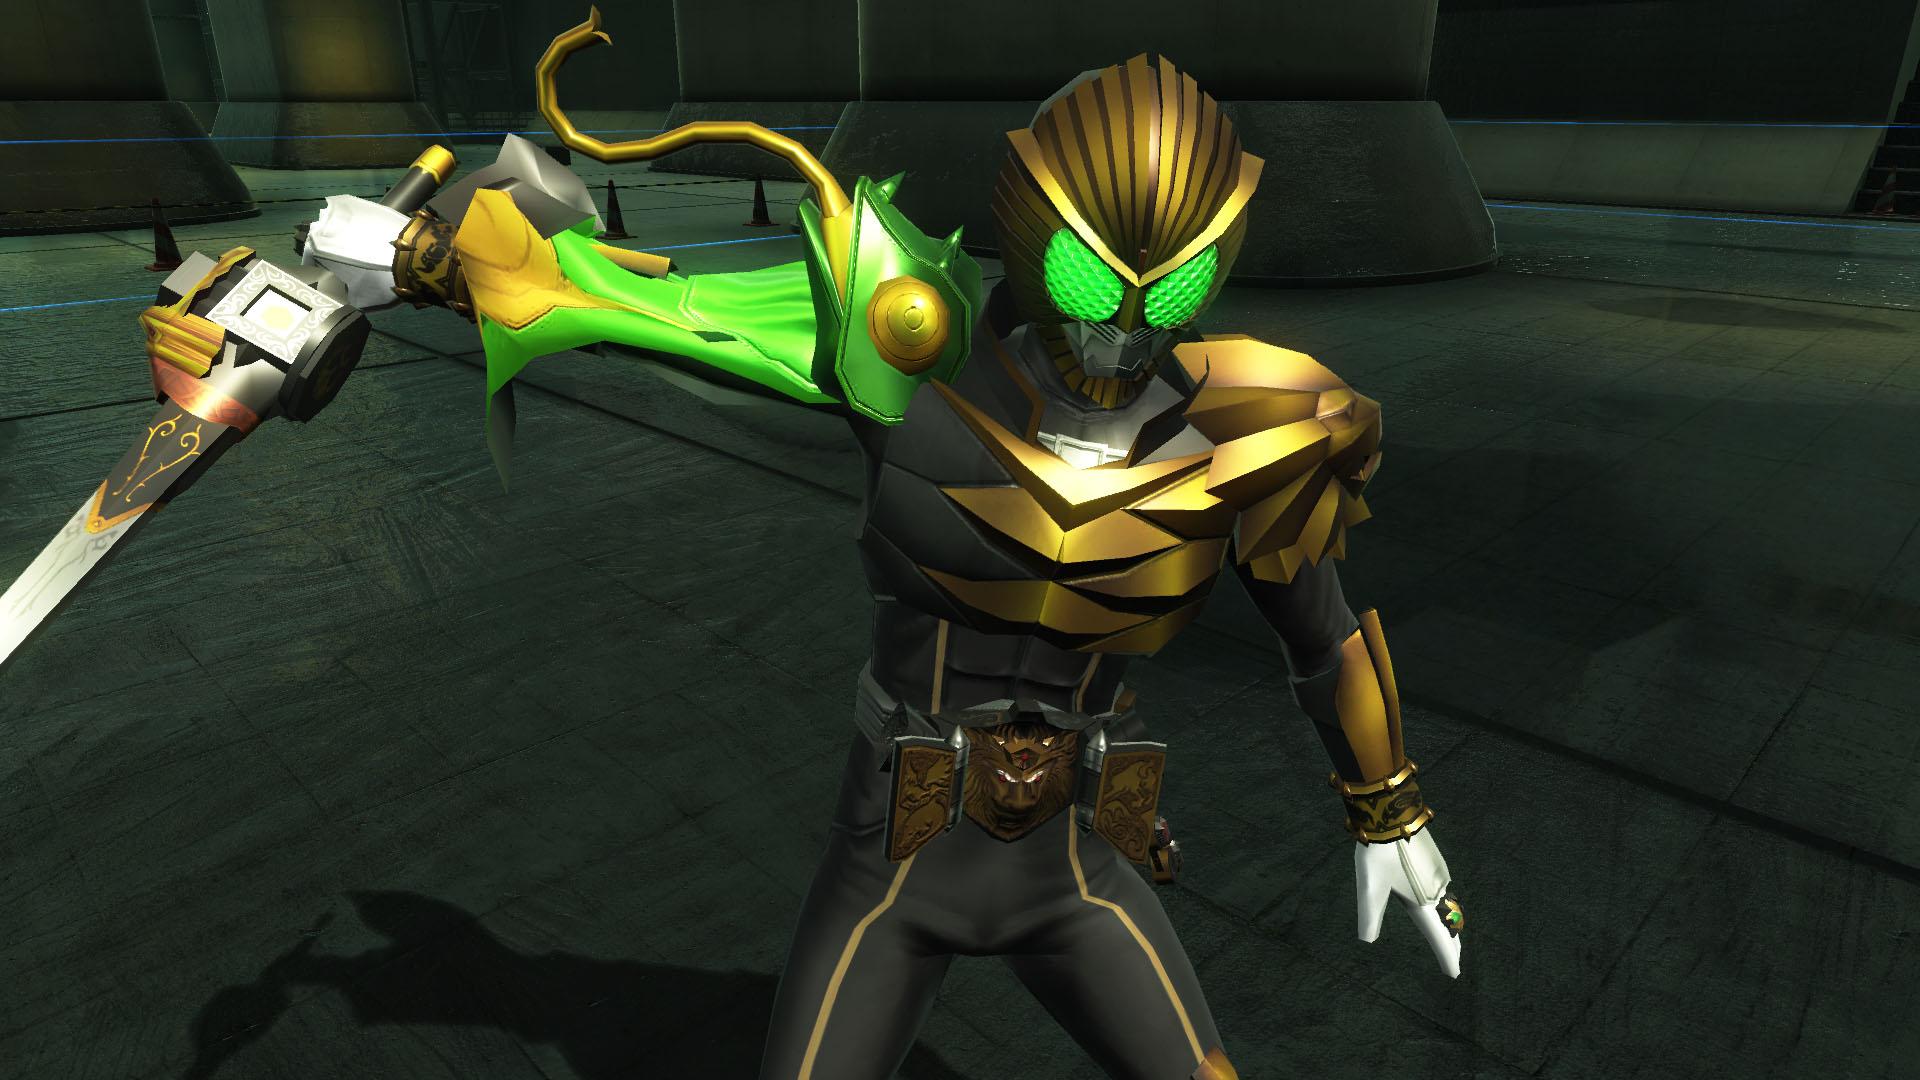 Kamen-Rider-Climax-Fighters_2017_11-27-17_018